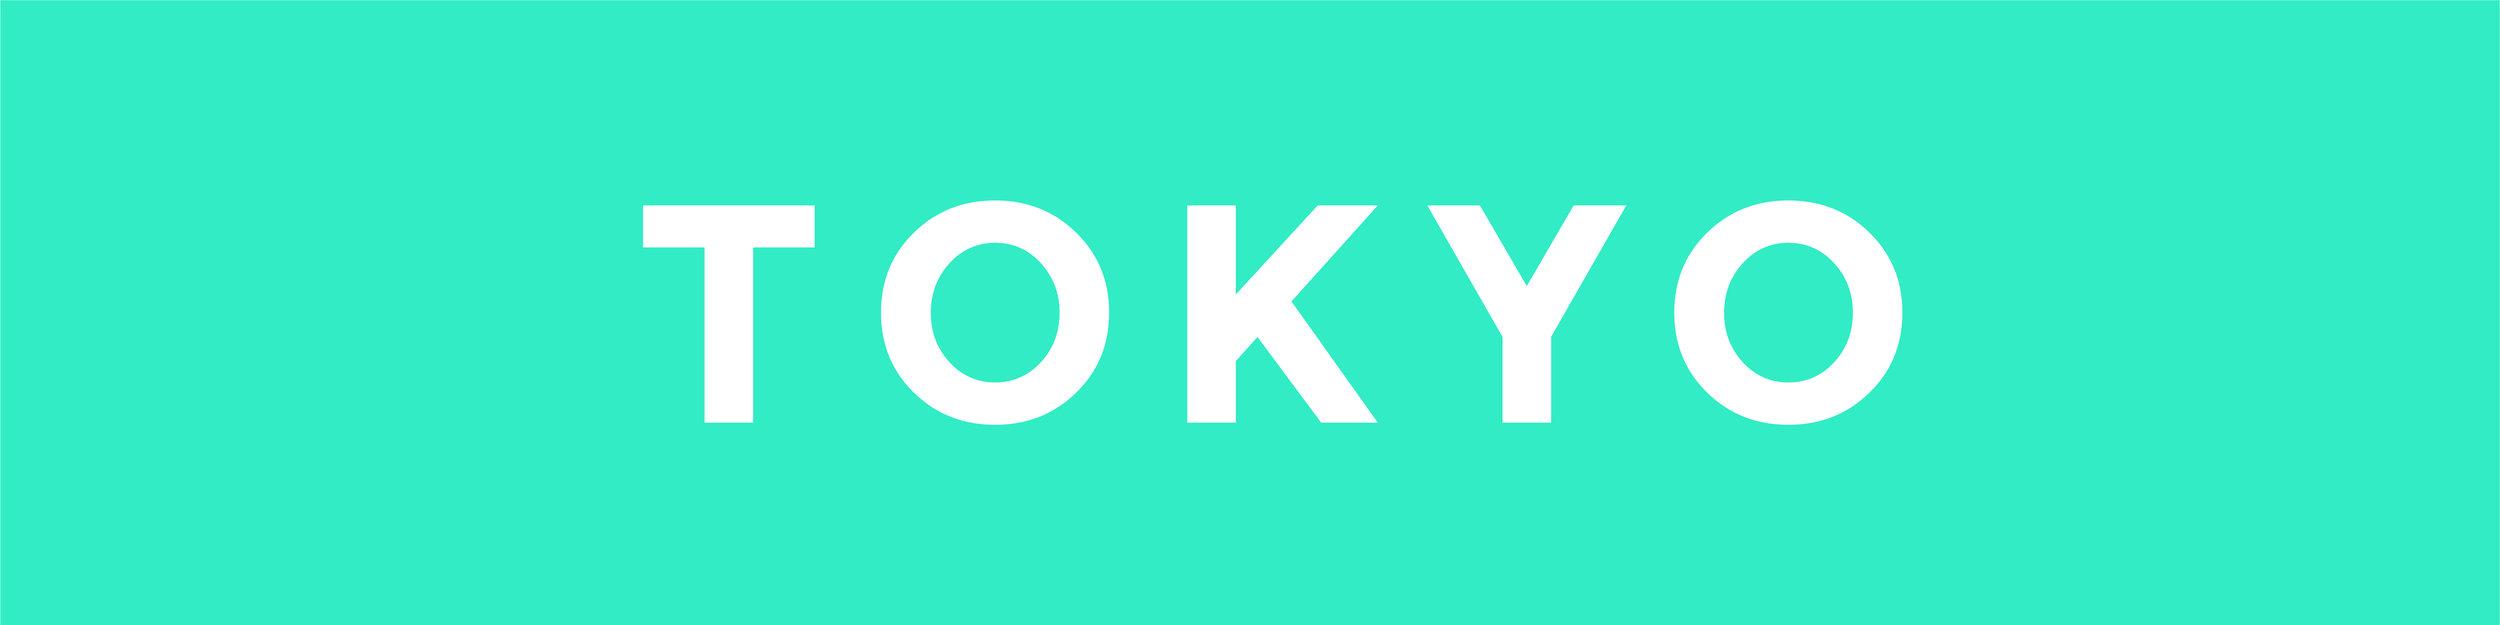 [協賛]東急電鉄 [特別協力]渋谷ヒカリエ